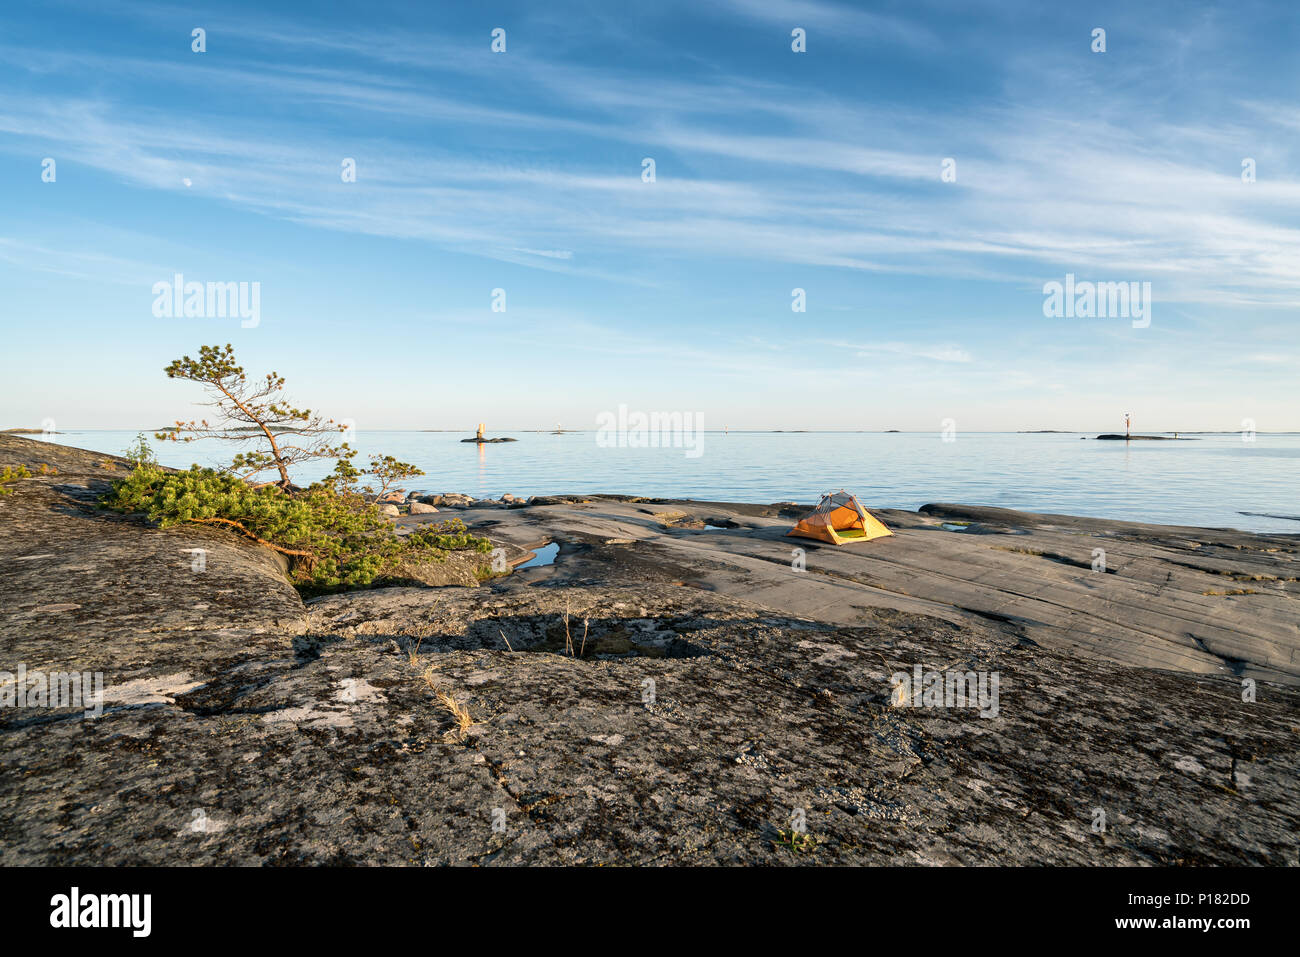 Camping am Glosholmen Insel Archipel, Porvoo, Finnland, Europa, EU Stockbild